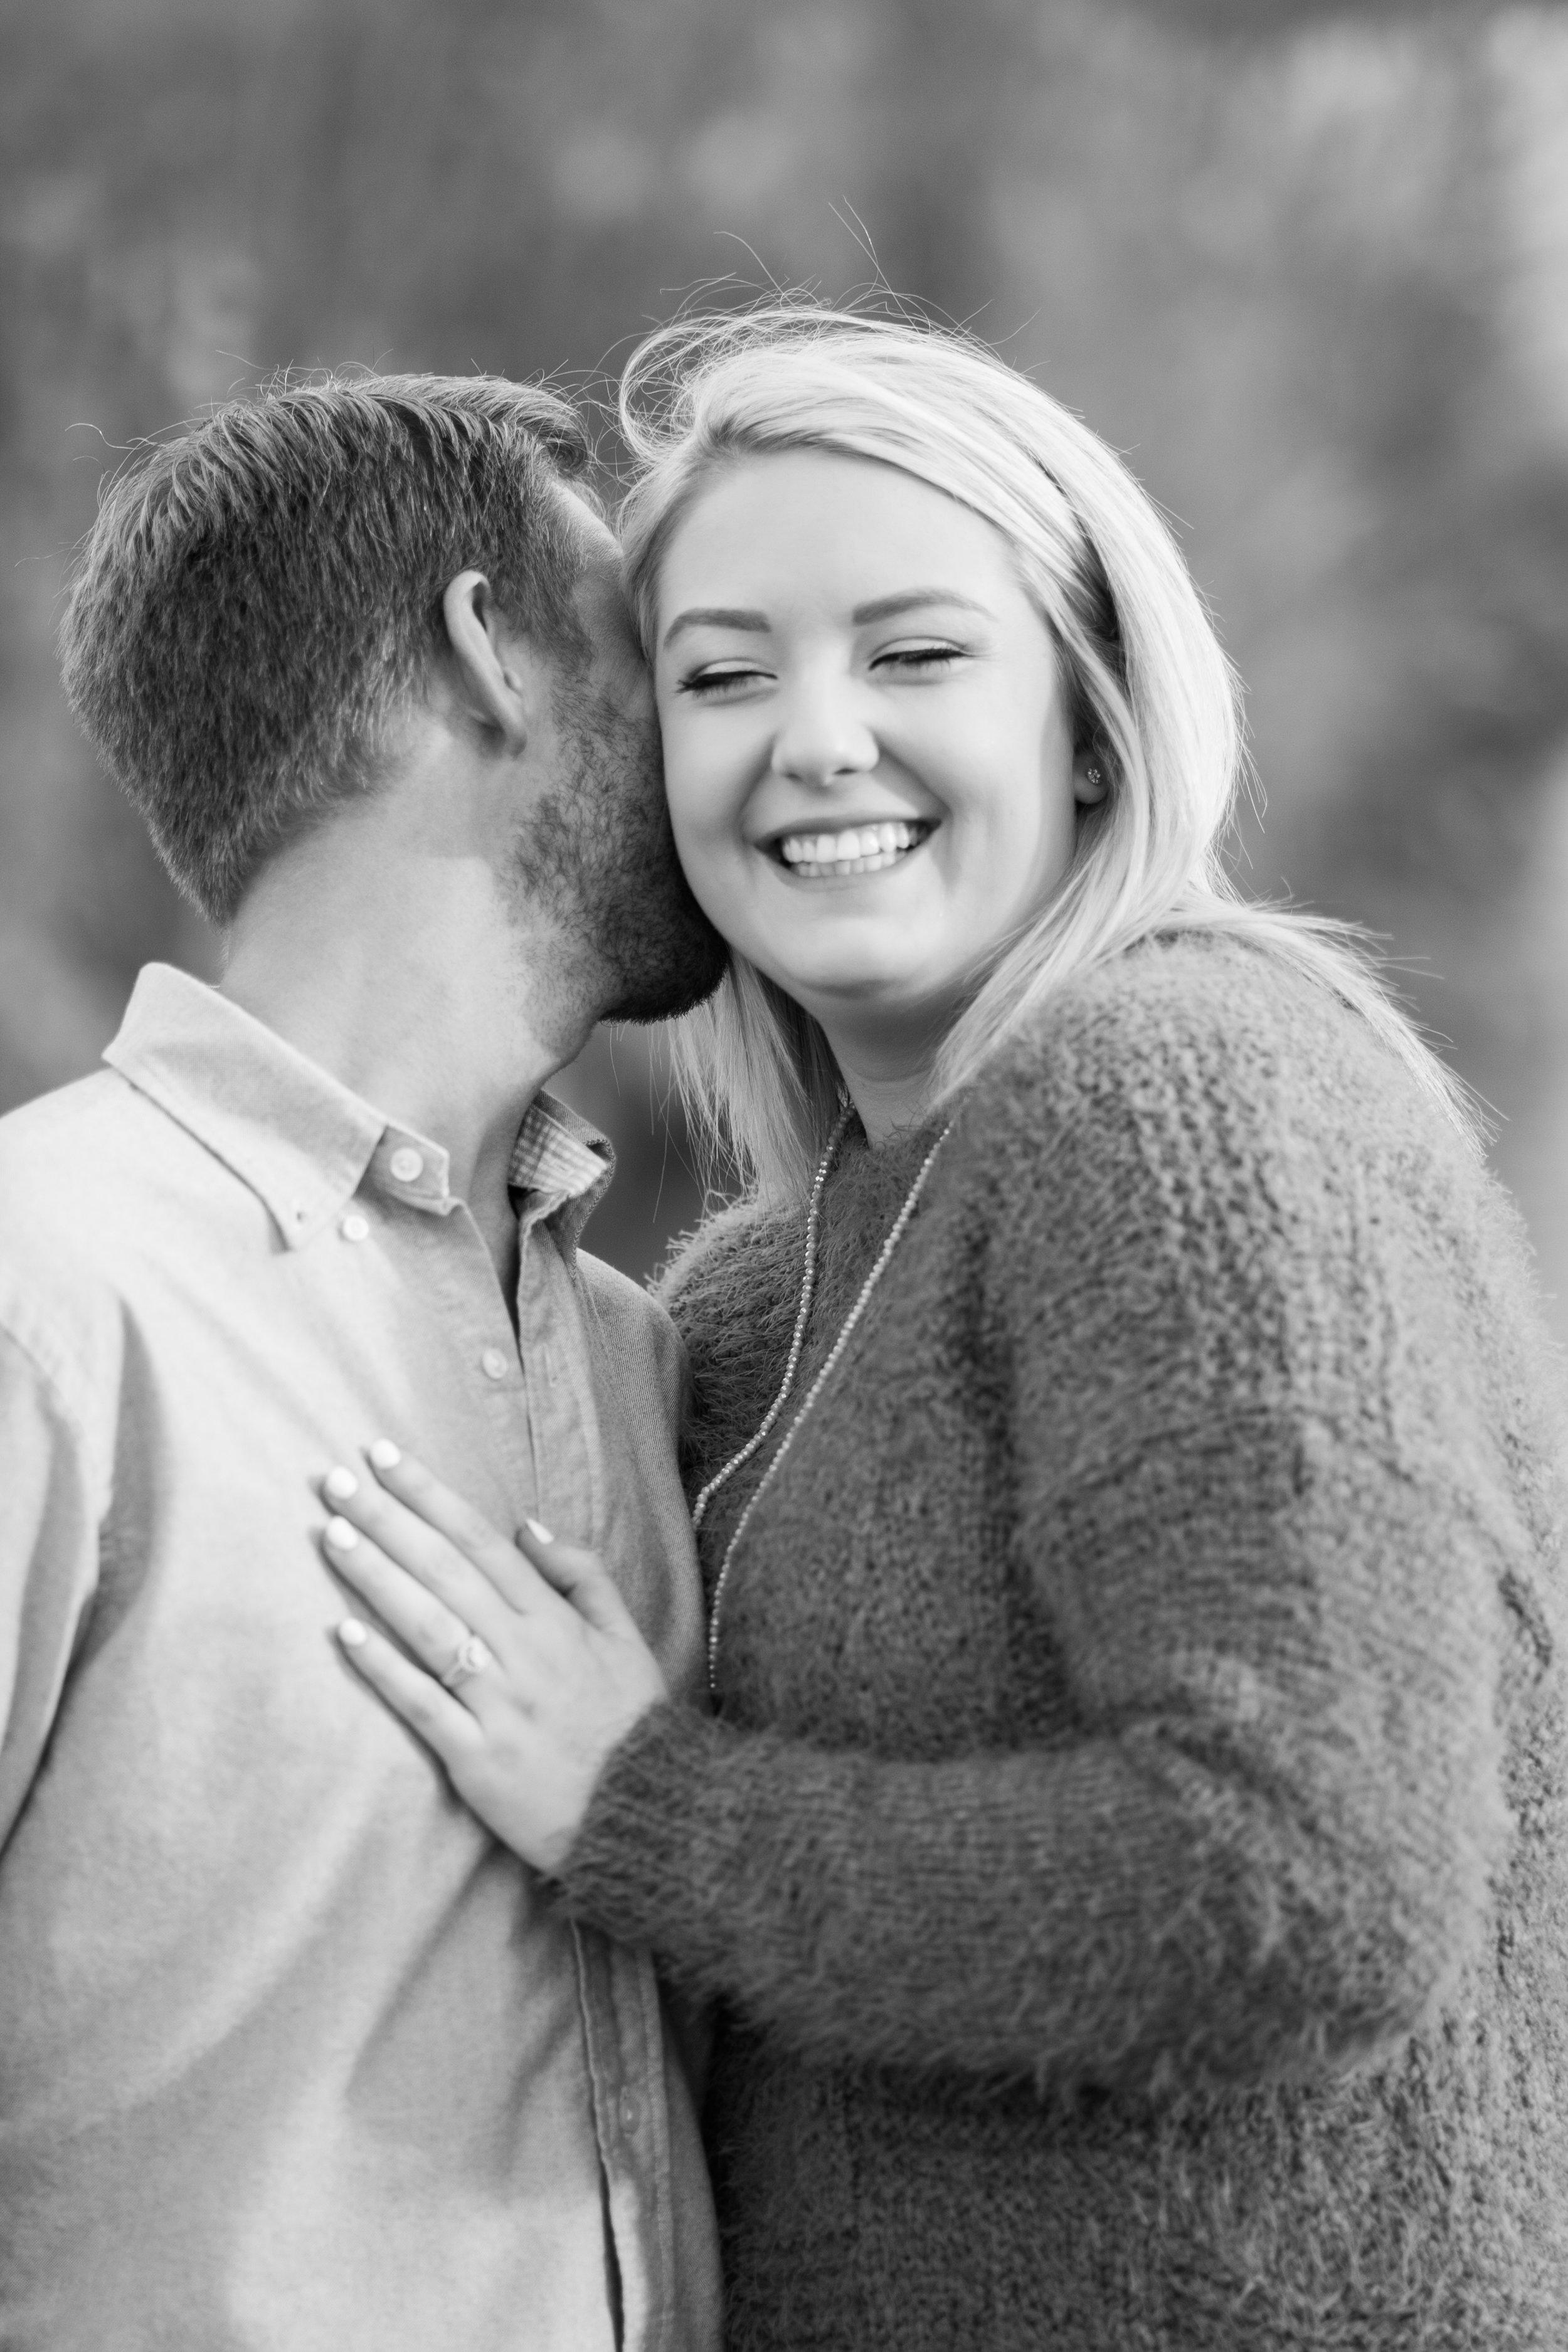 Alabama-Wedding-Photographer-Nick-Drollette-118.jpg